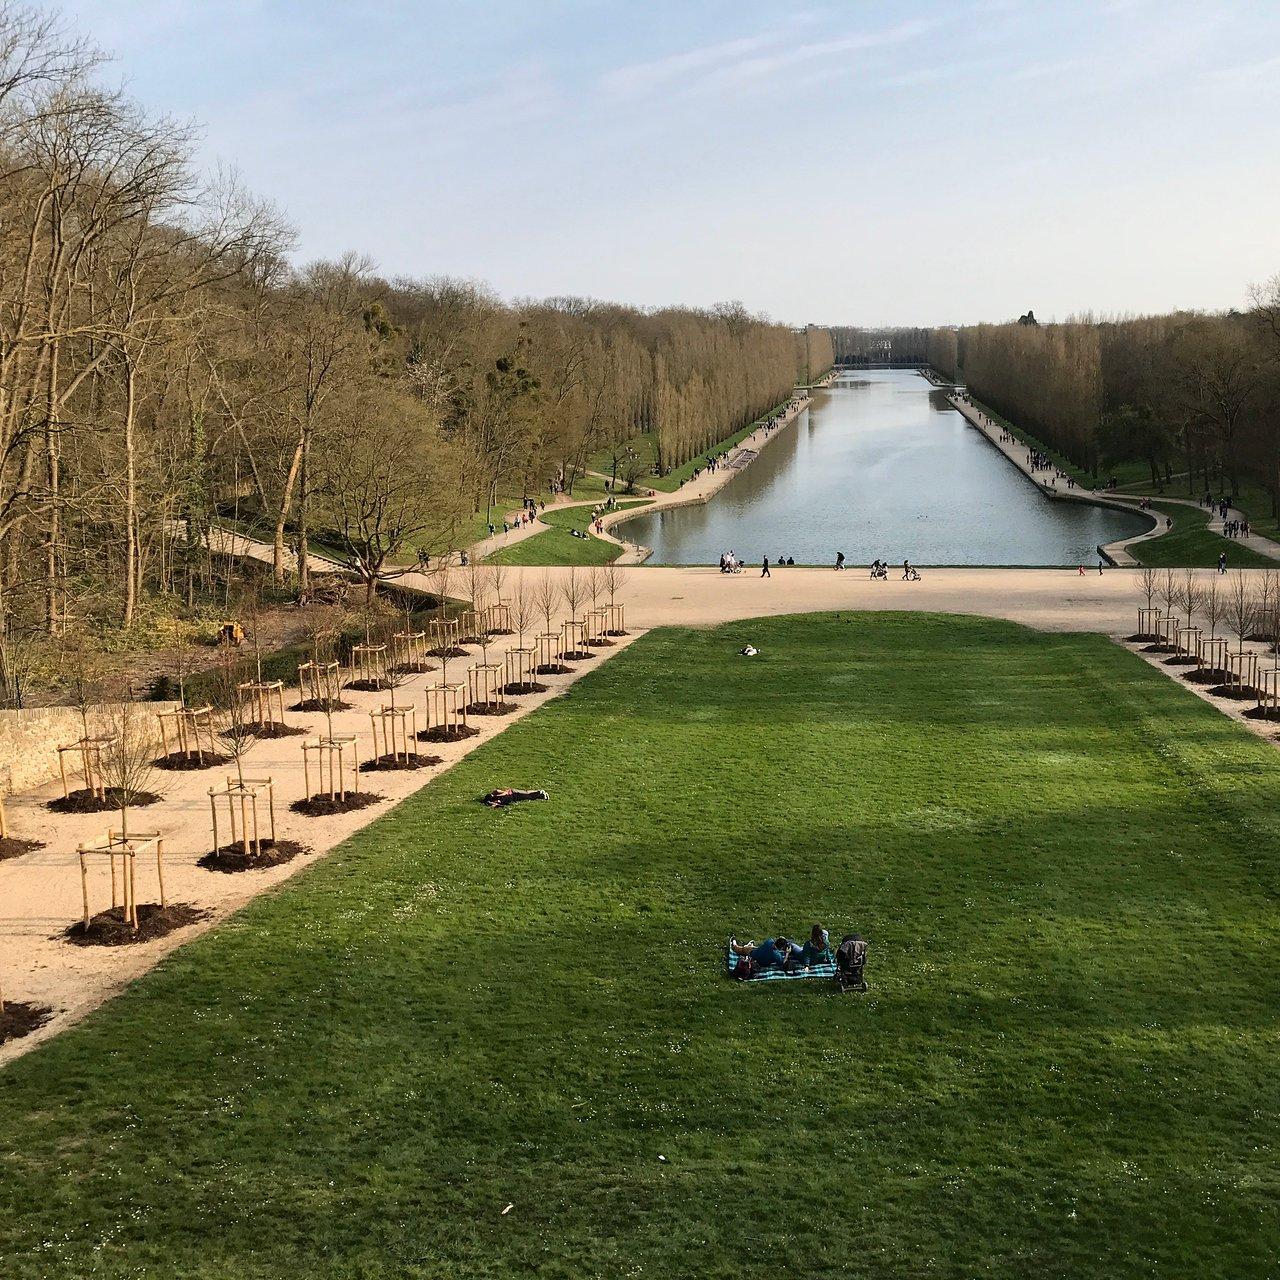 Parc De Sceaux - Parc De Sceaux Yorumları - Tripadvisor à Piscine Sceaux